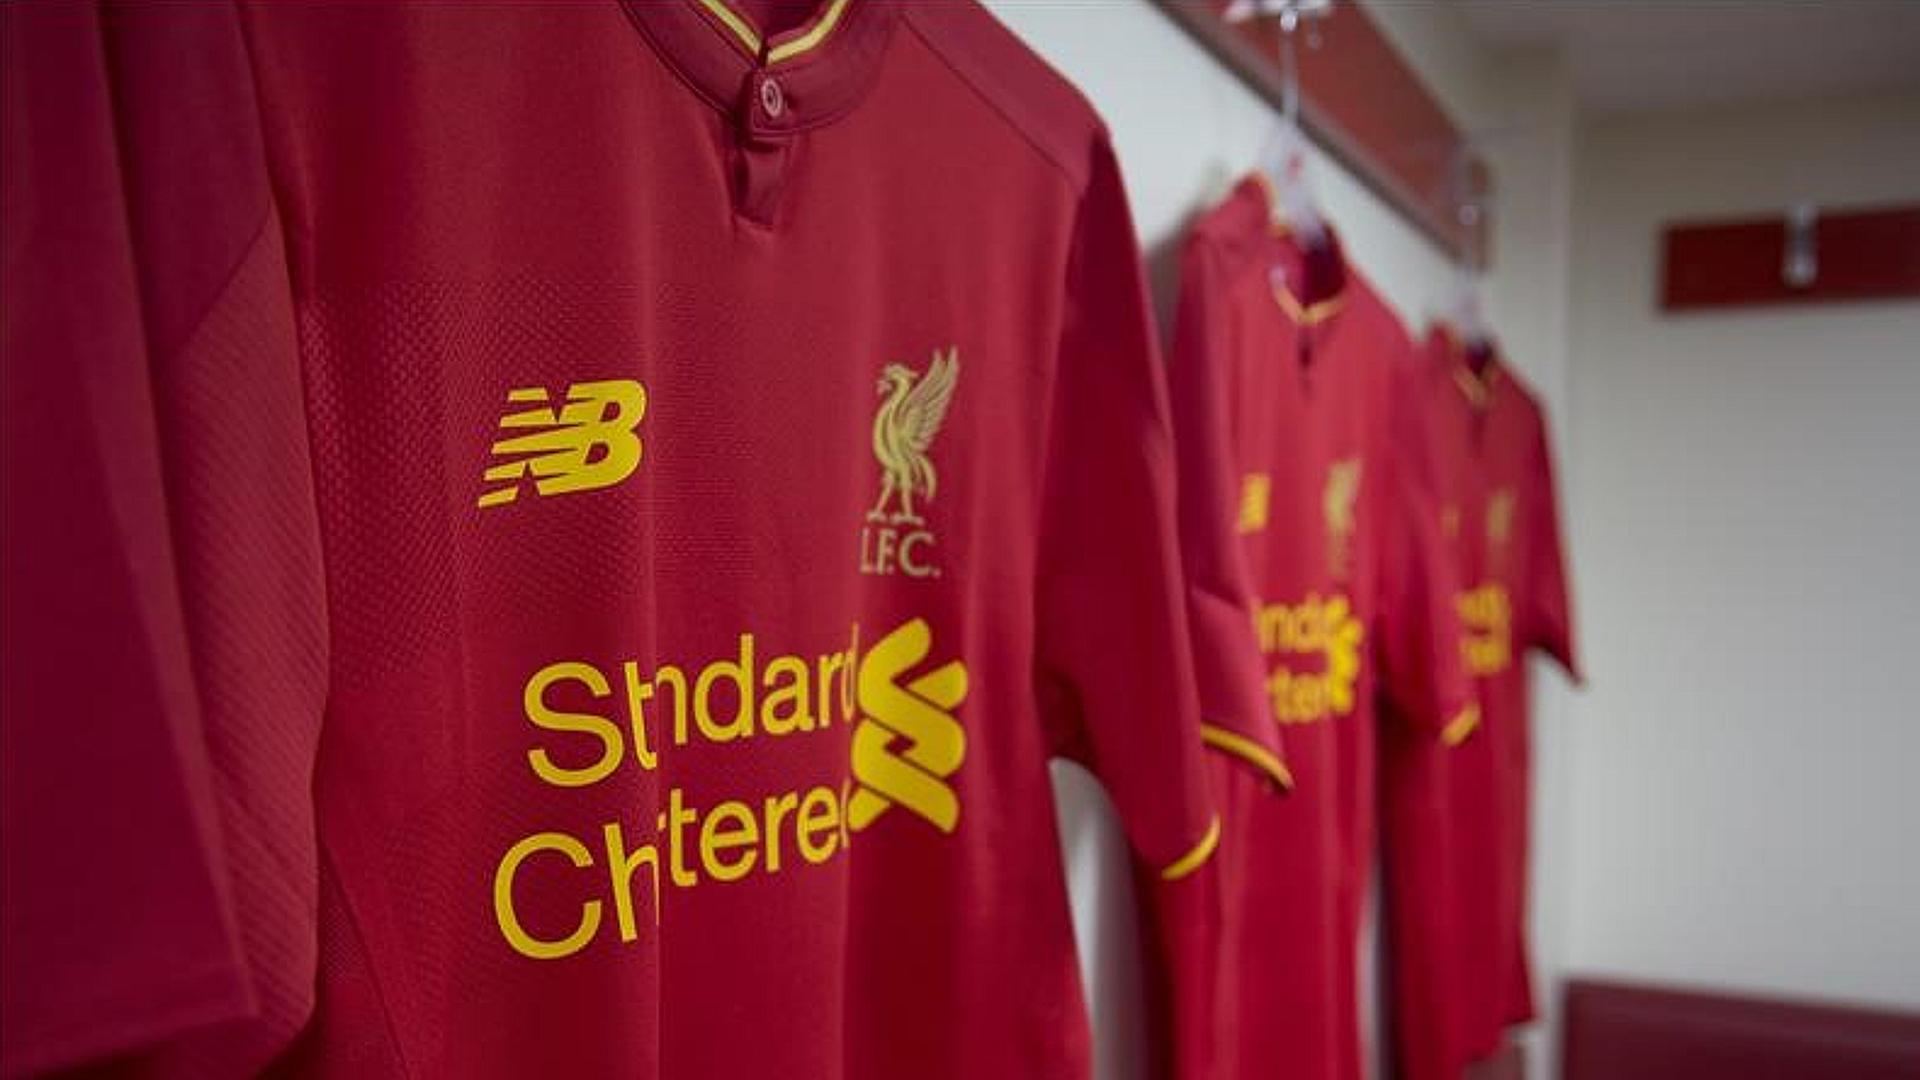 Tumor maligno Aterrador productos quimicos  New Balance atrapa la Champions junto al Liverpool | The Luxonomist